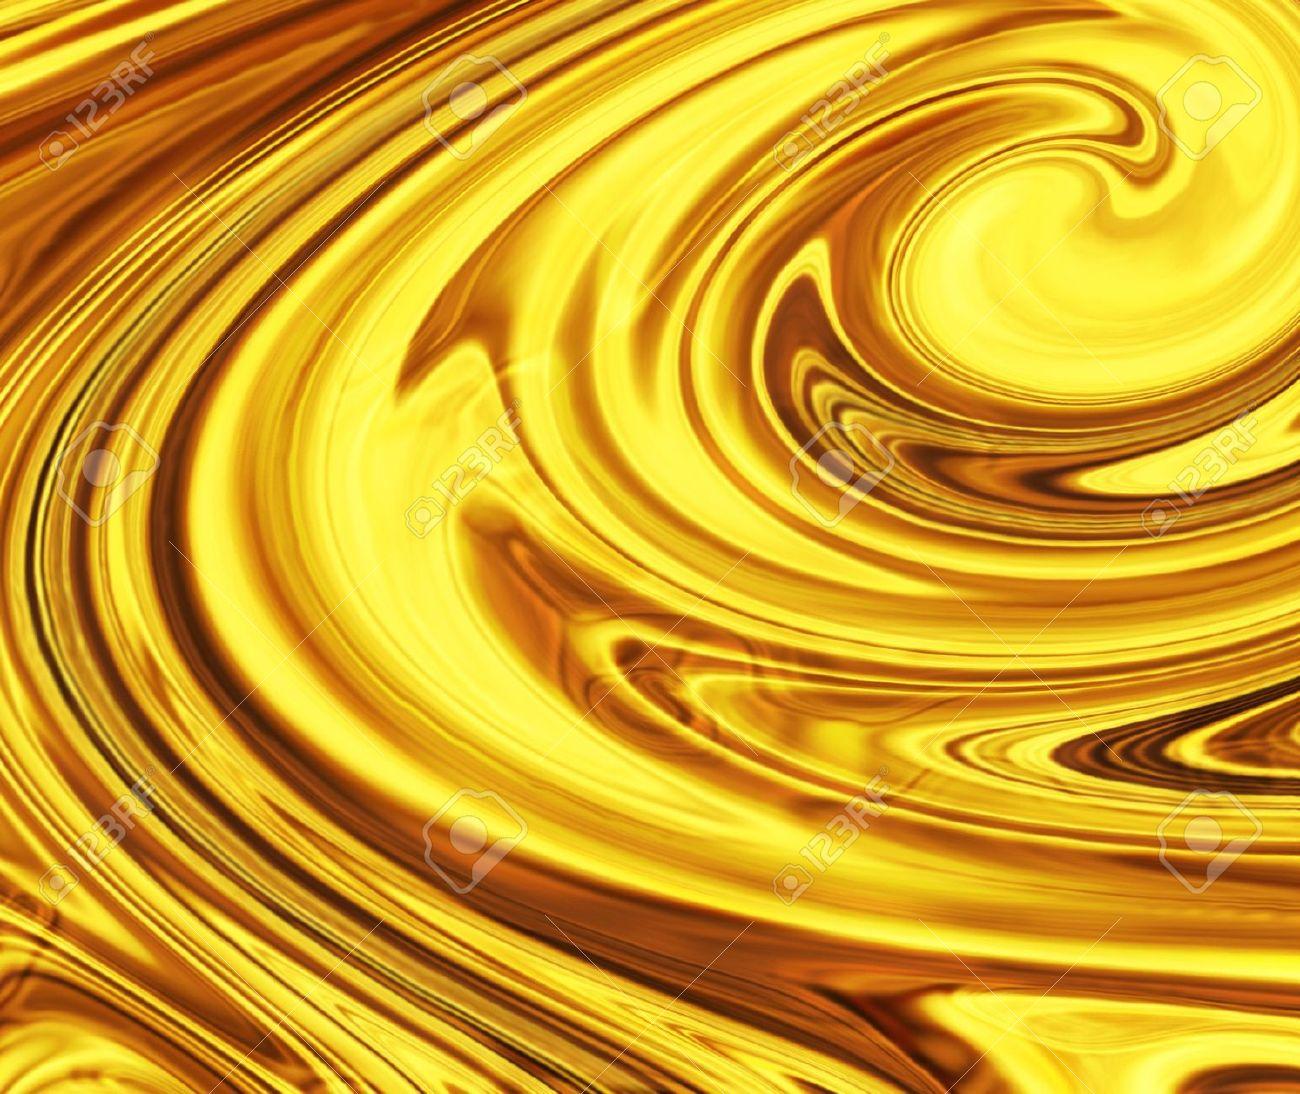 870cbf54788f Foto de archivo - Oro líquido o aceite o líquido de color amarillo - a  pantalla completa